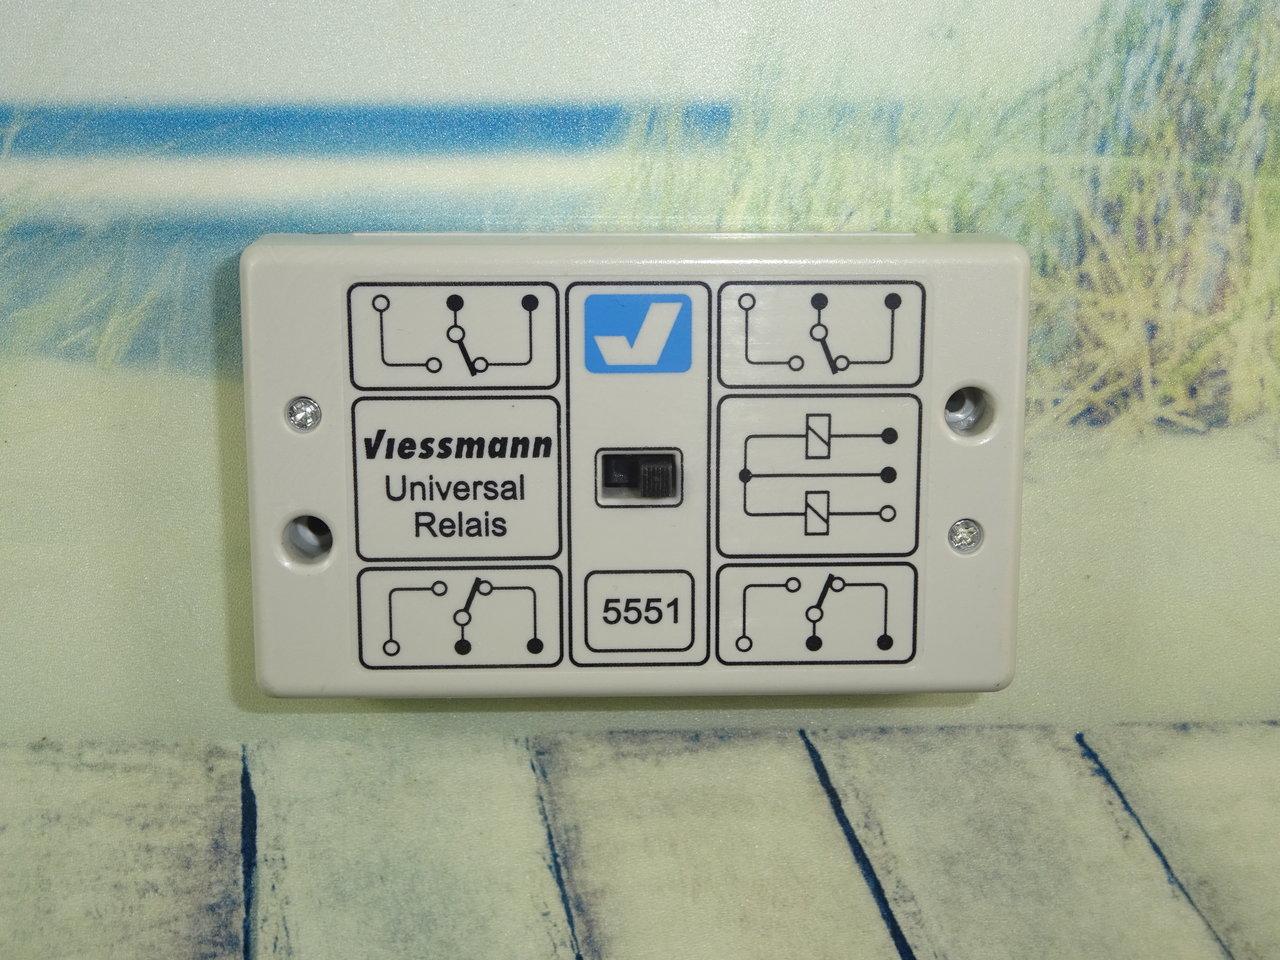 viessmann 5551 universalrelais relais. Black Bedroom Furniture Sets. Home Design Ideas